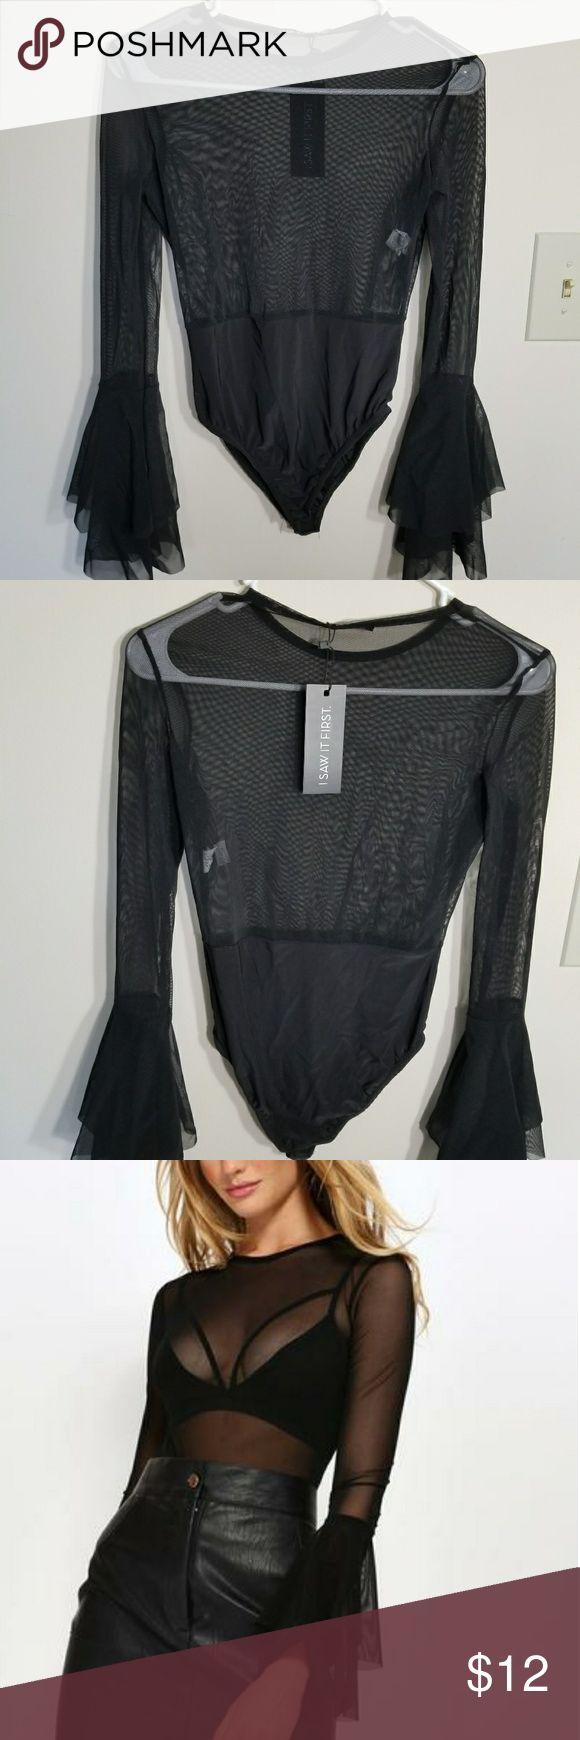 Lace bodysuit i saw it first   best My Posh Closet images on Pinterest  Long dress patterns